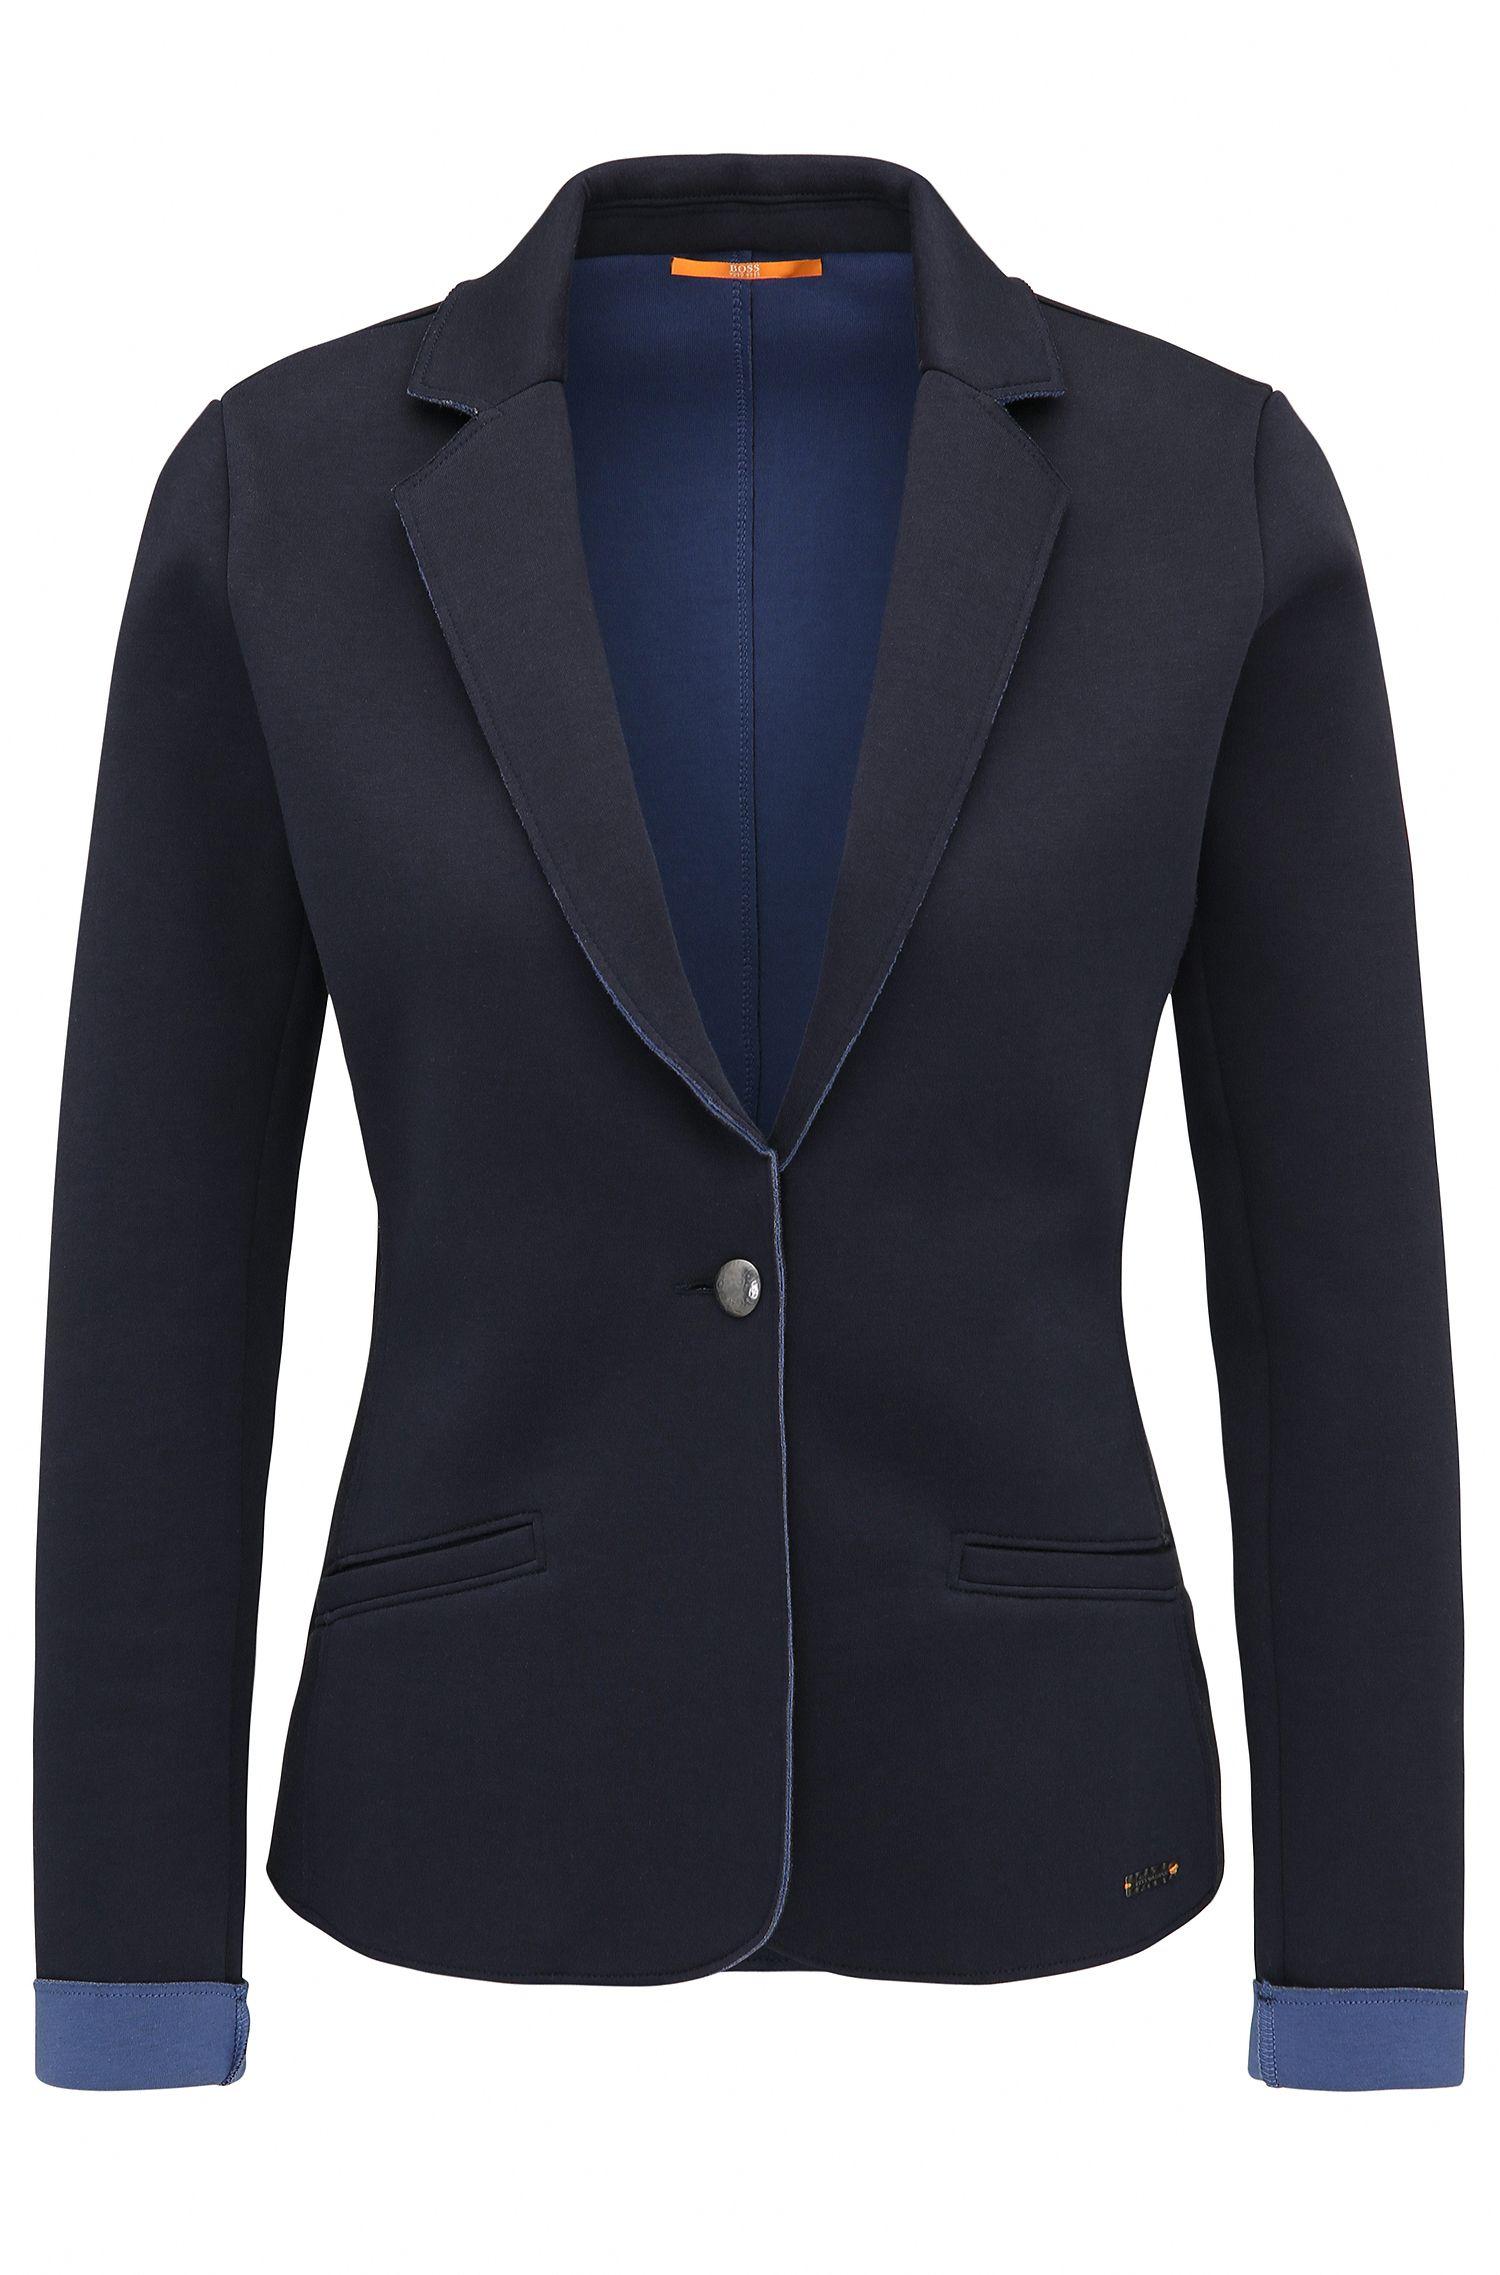 Veste Slim Fit en jersey simple thermocollé